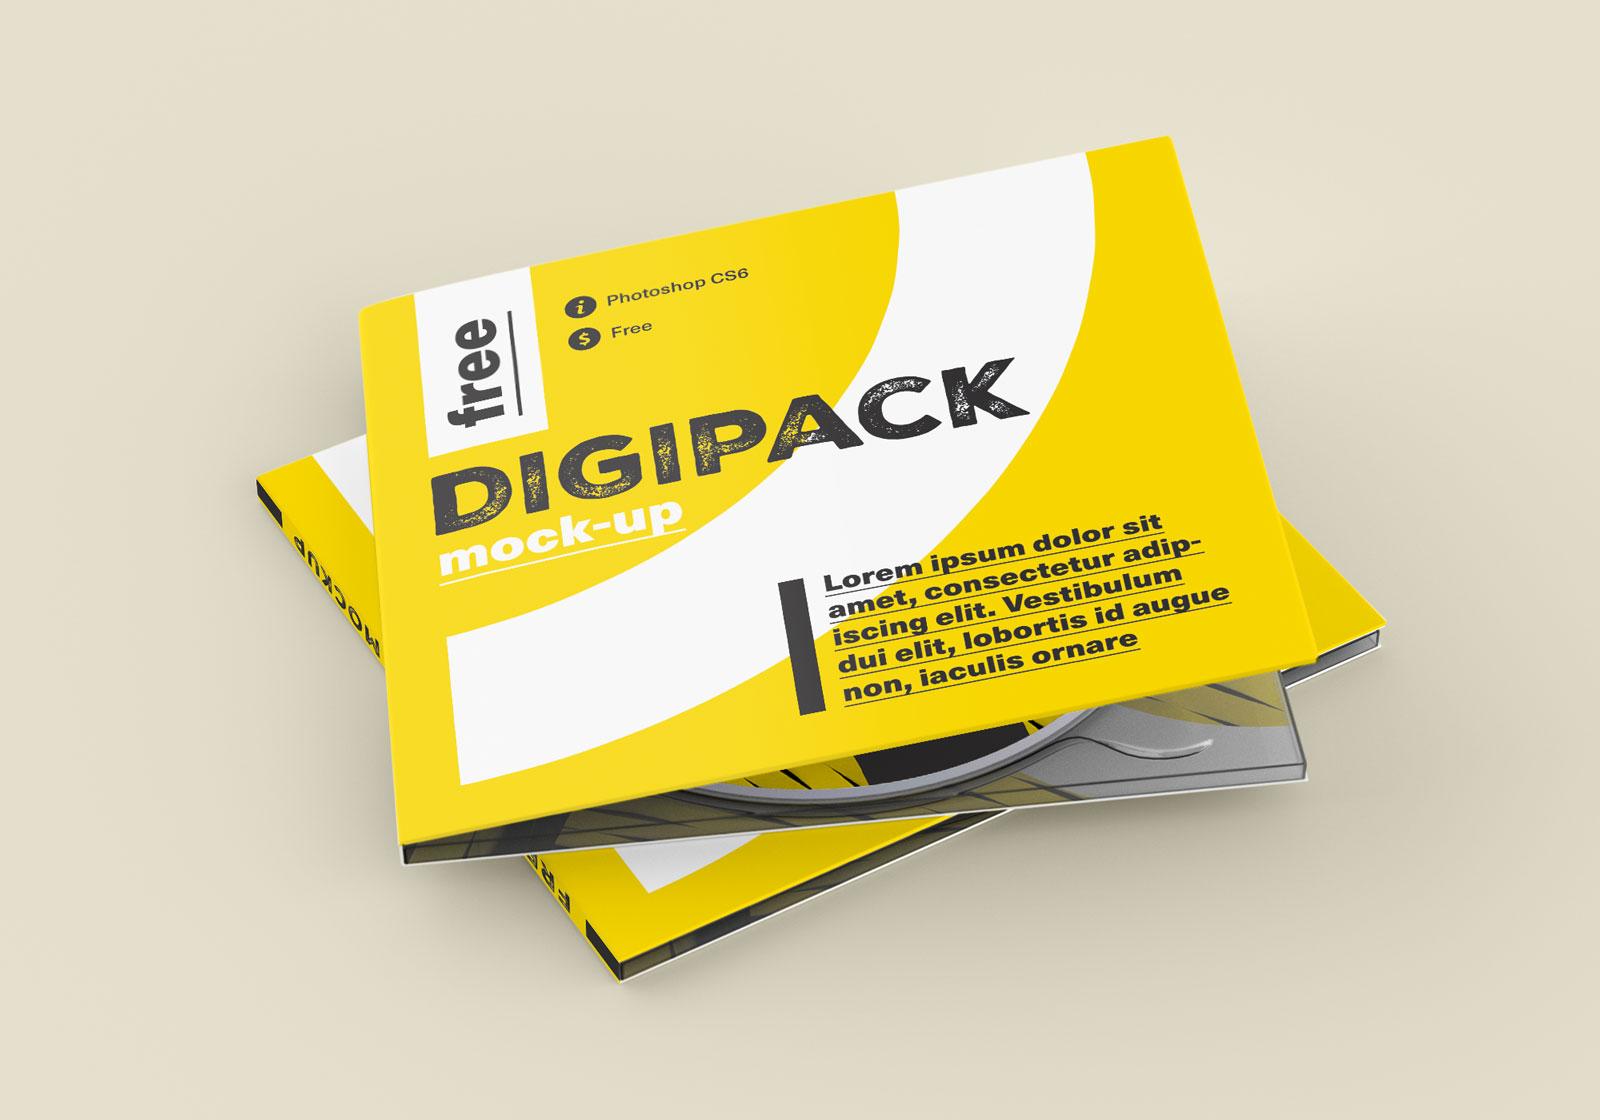 Free-CD-Disc-DVD-Case-Digipack-Mockup-PSD-2